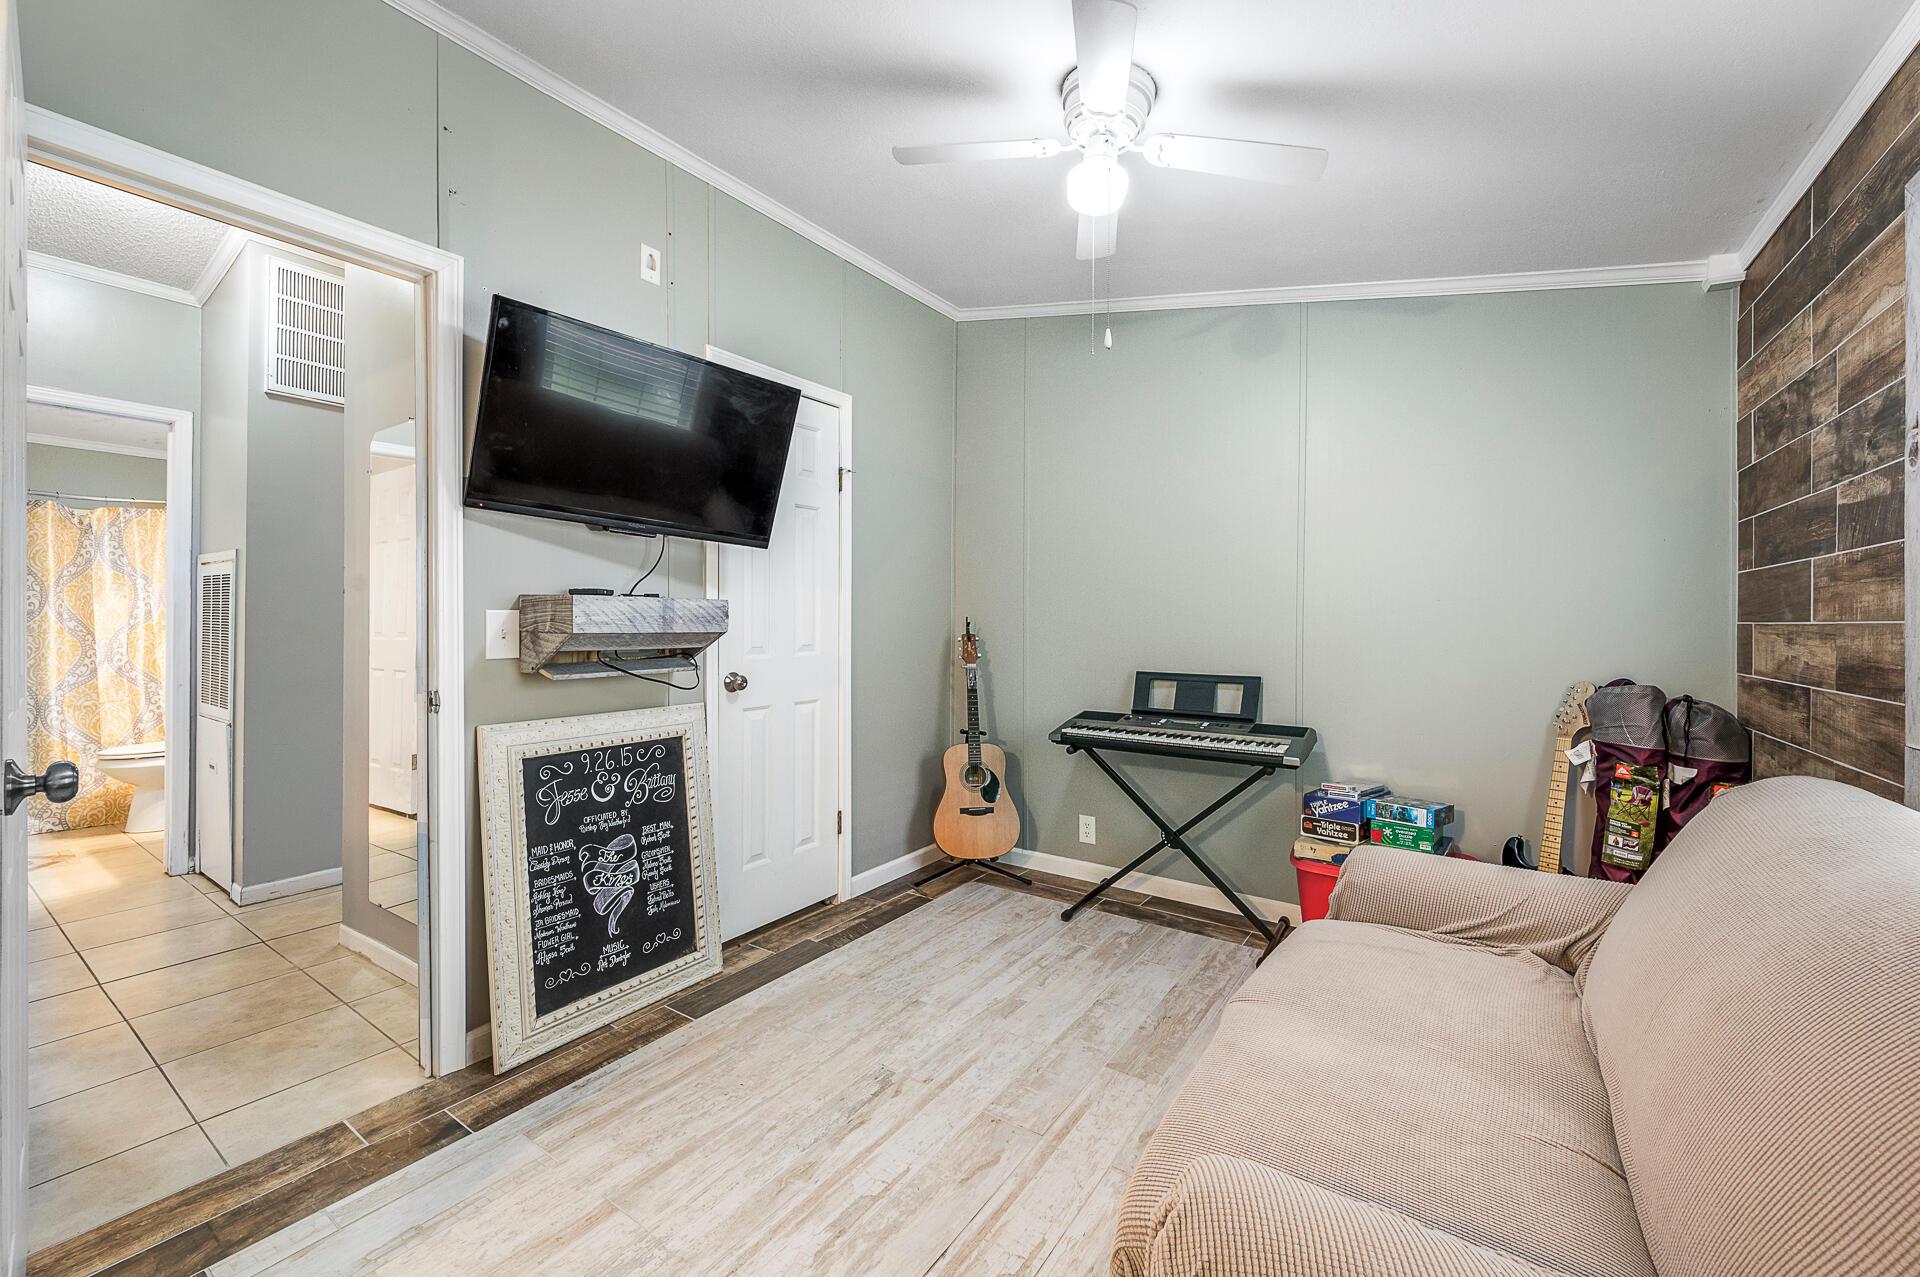 Clemson Terrace Homes For Sale - 250 Medina, Summerville, SC - 13